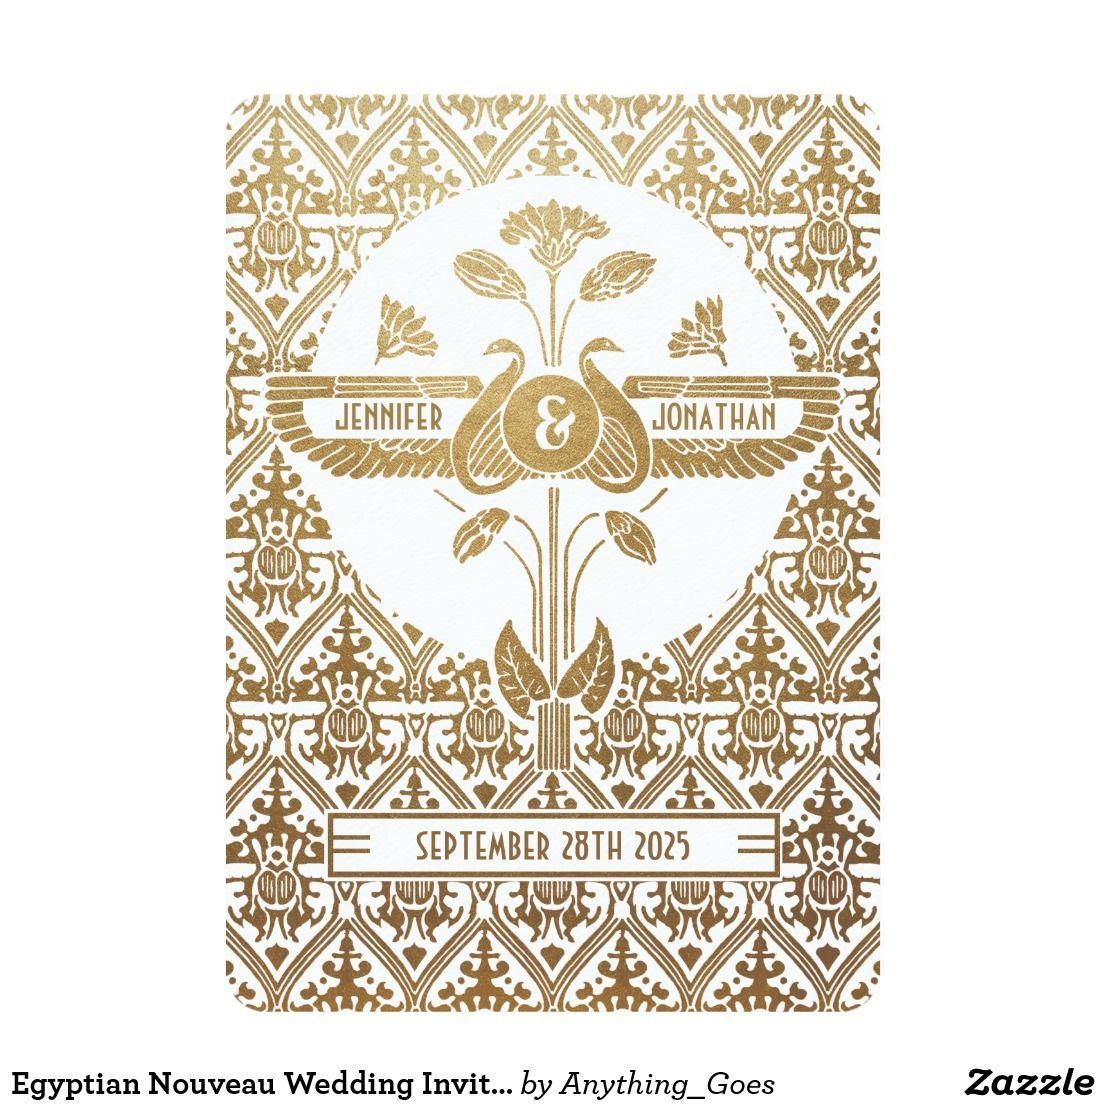 Egyptian Nouveau Wedding Invitations Gold & White | Weddings and Wedding